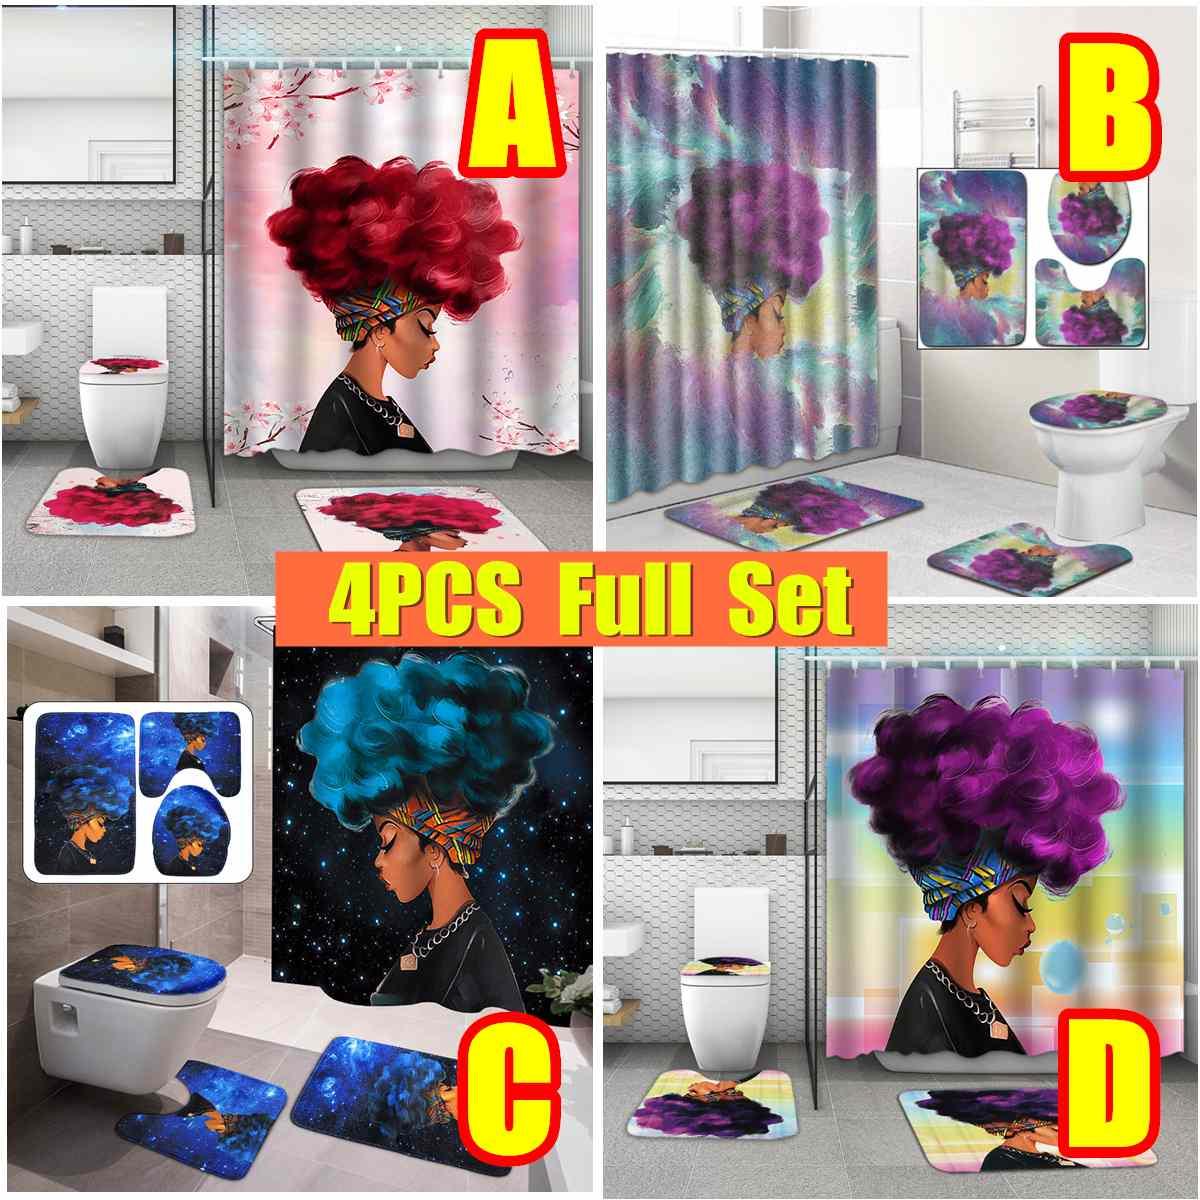 Toilet-Seat-Cover 3Pcs/Set Floor Rugs Cushion Bath Mat For Home Decoration Soft Cushion Non-Slip Comfortable Kitchen Carpet